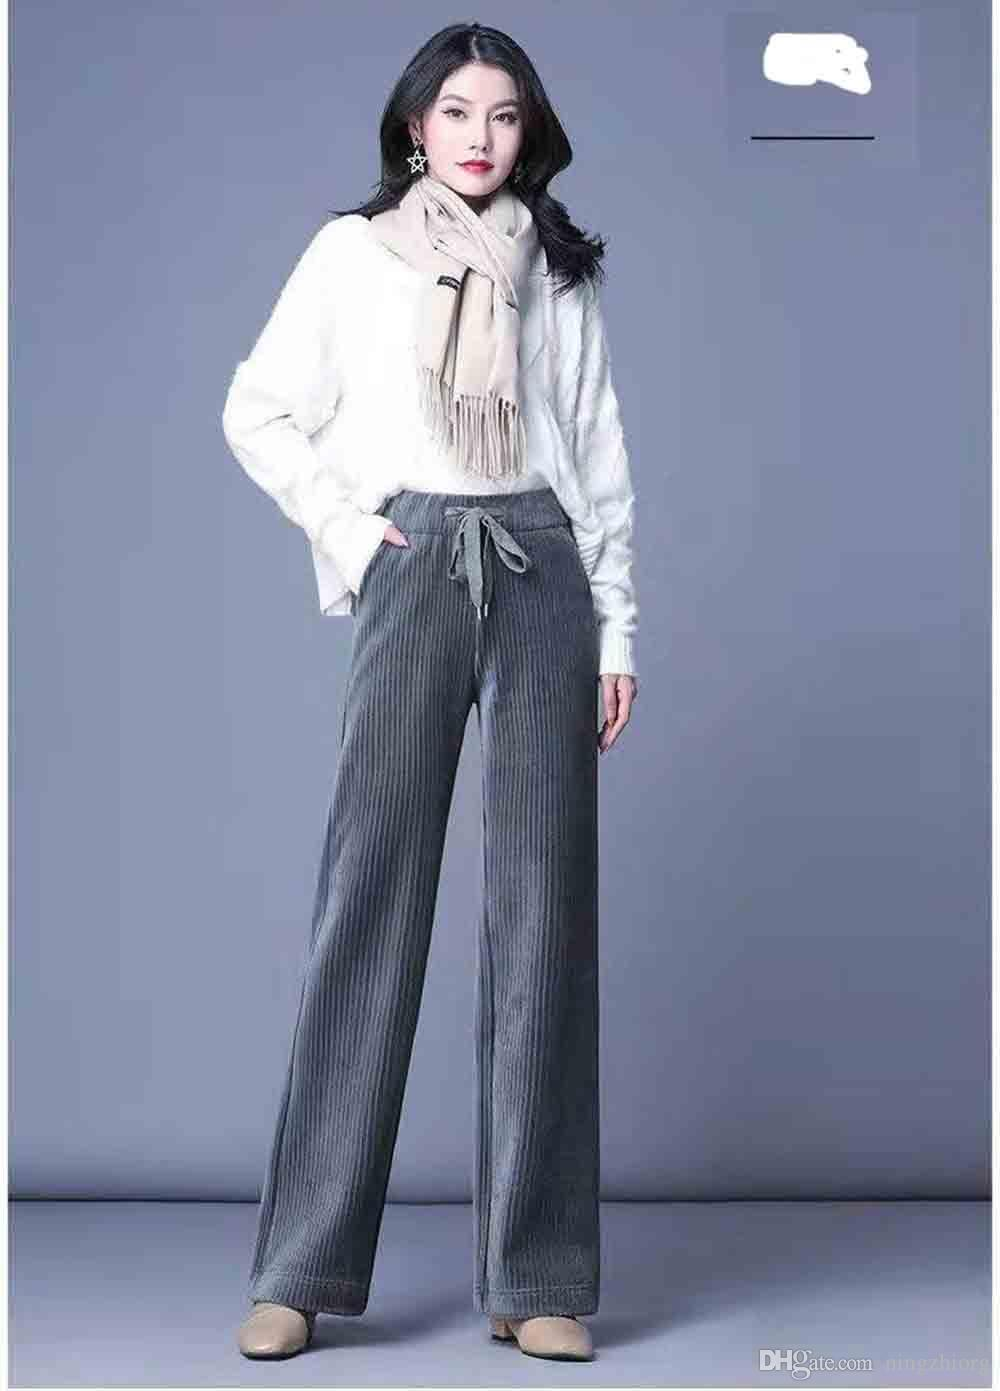 2019 winter new large size high waist draped straight stripe pants fat corduroy pants loose casual wide leg pants women